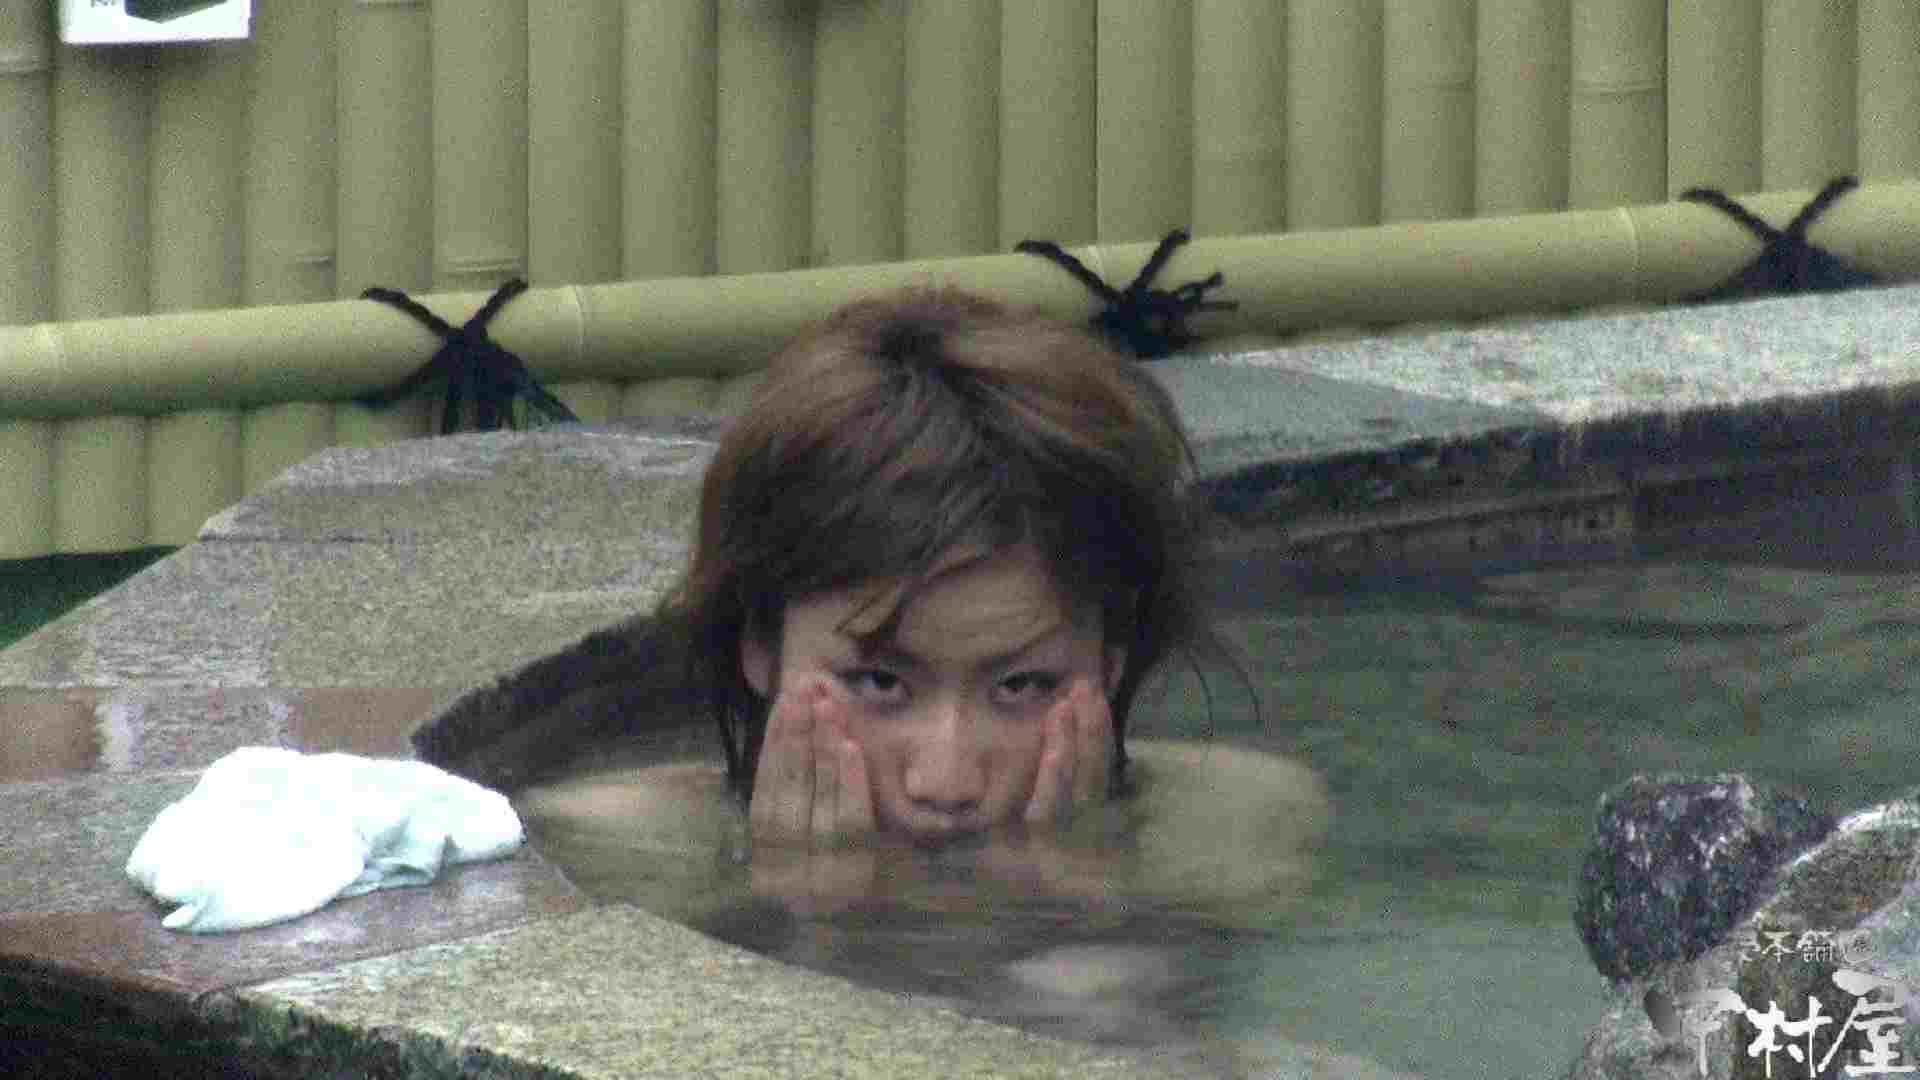 Aquaな露天風呂Vol.918 盗撮師作品  75pic 54